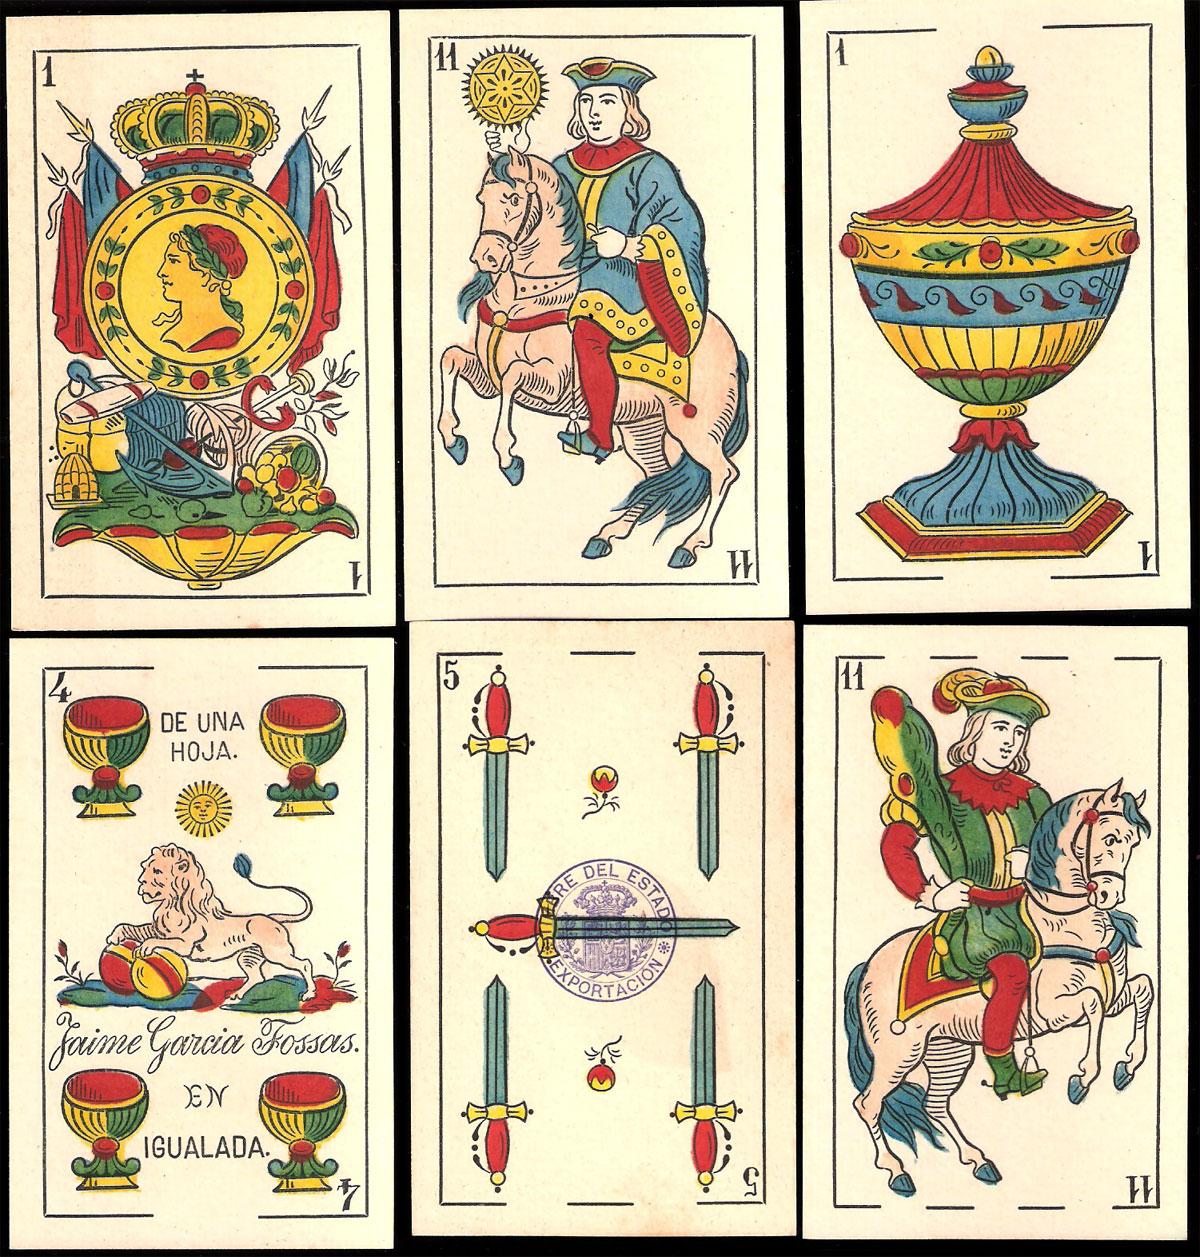 standard Catalan pattern deck manufactured by Jaime Garcia Fossas in Igualada (Barcelona), c.1904